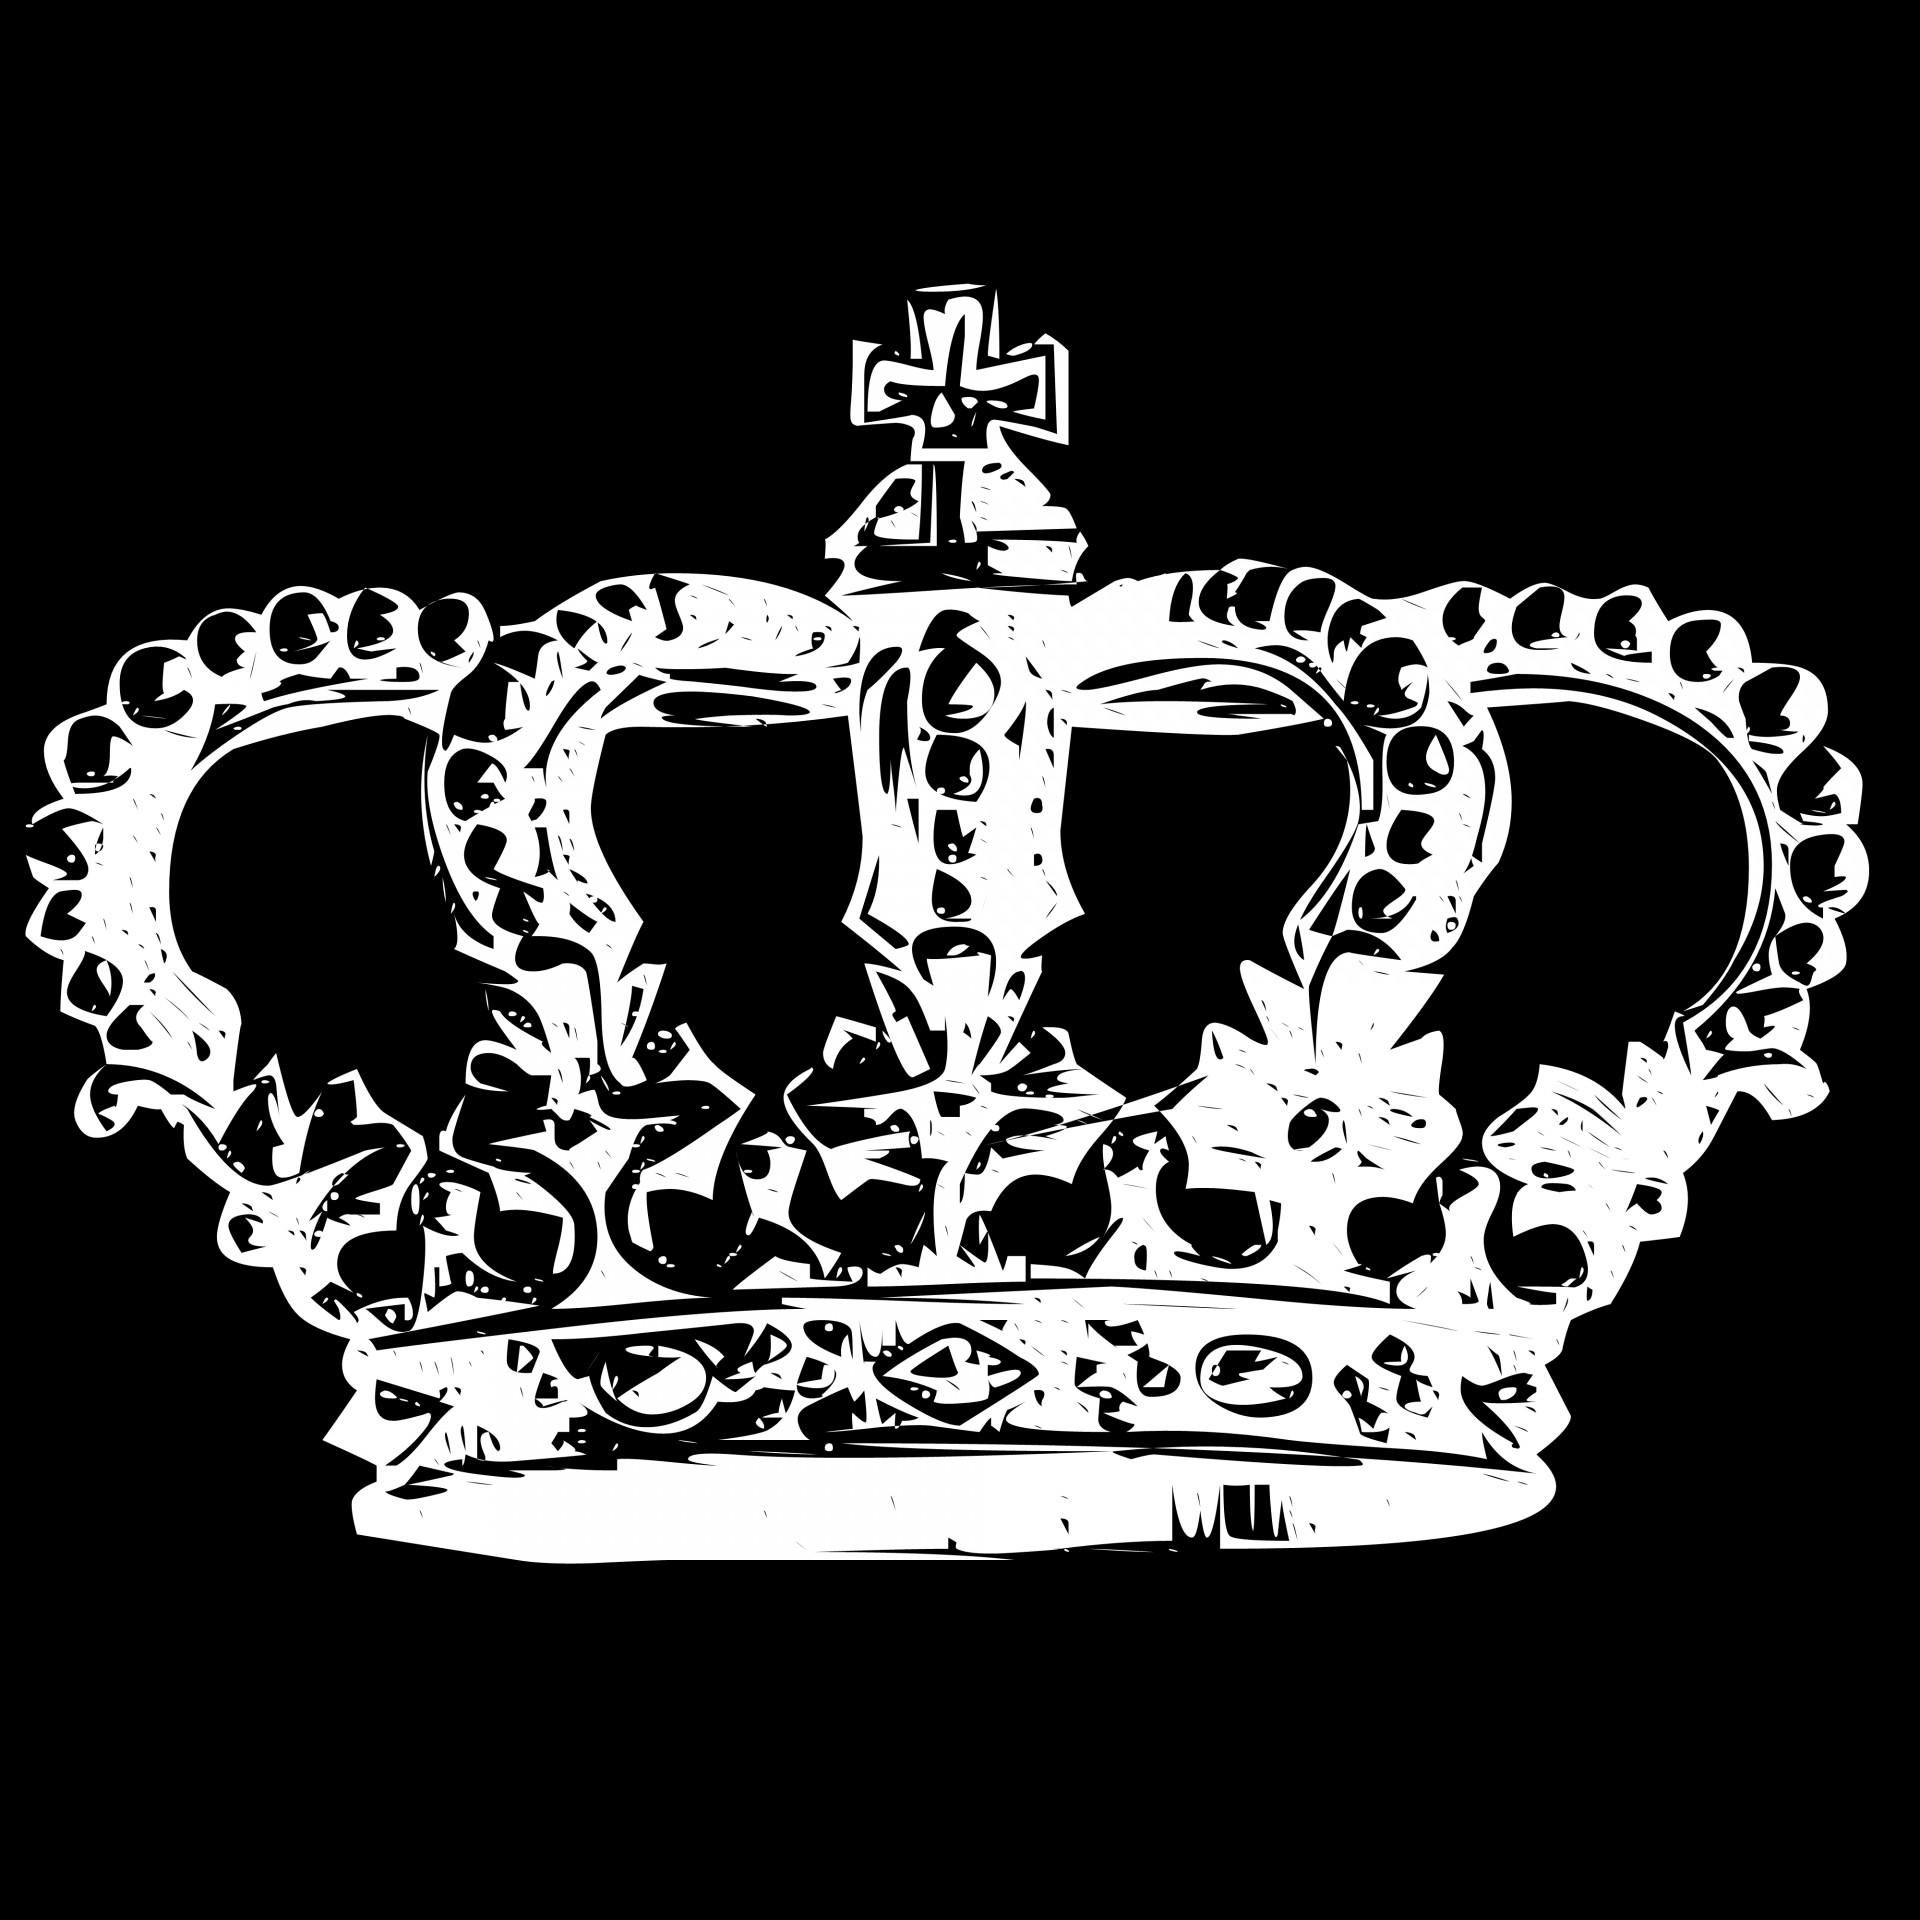 Sexy bud black crown super bowl xlvii teaser spots